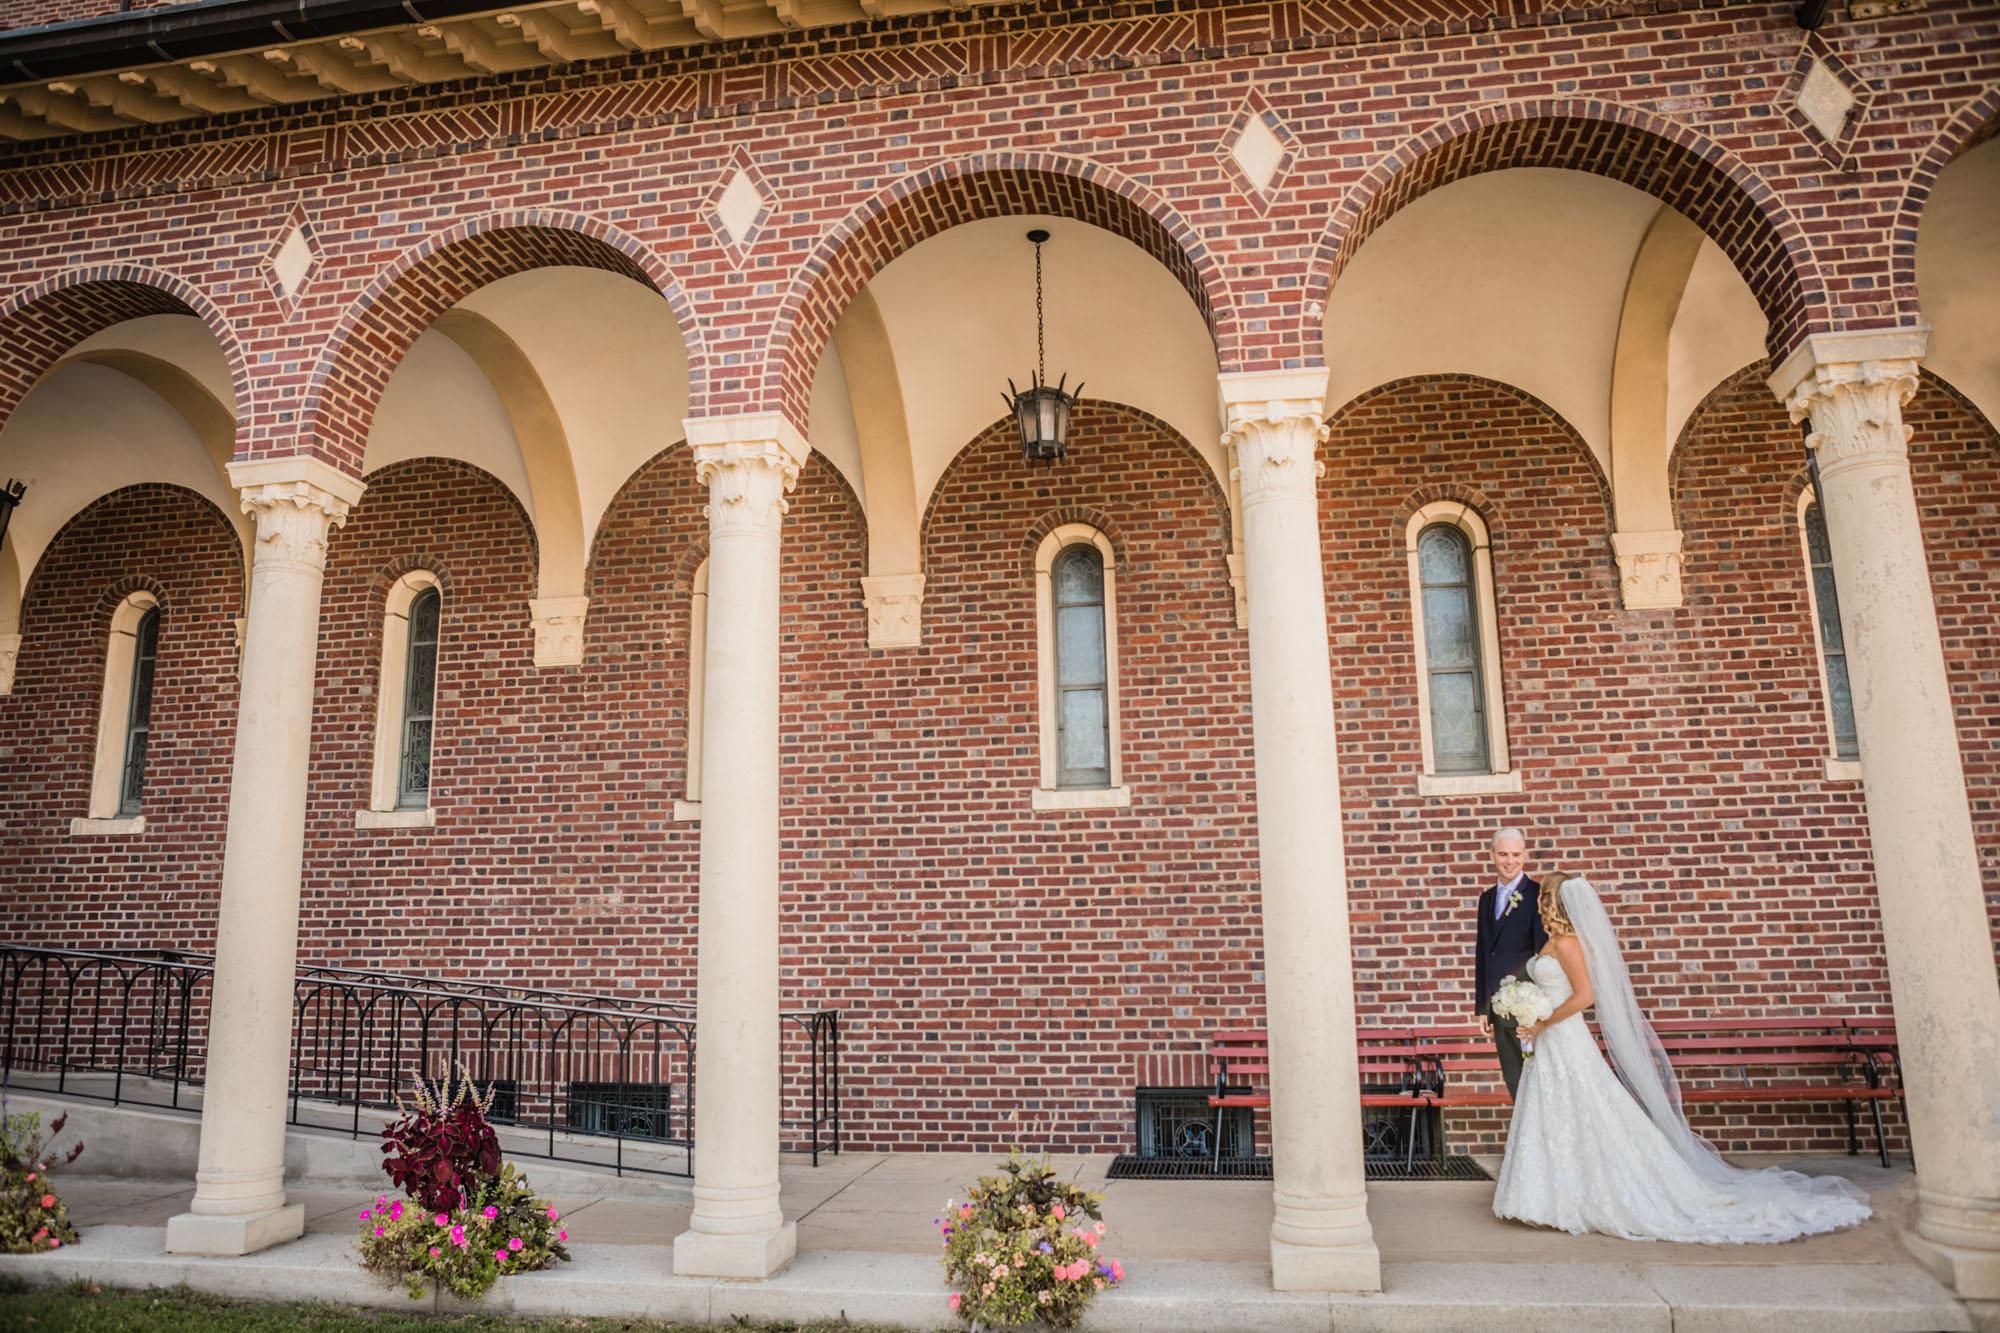 scranton_wedding_photographer_lettieri_pa (10 of 47).jpg